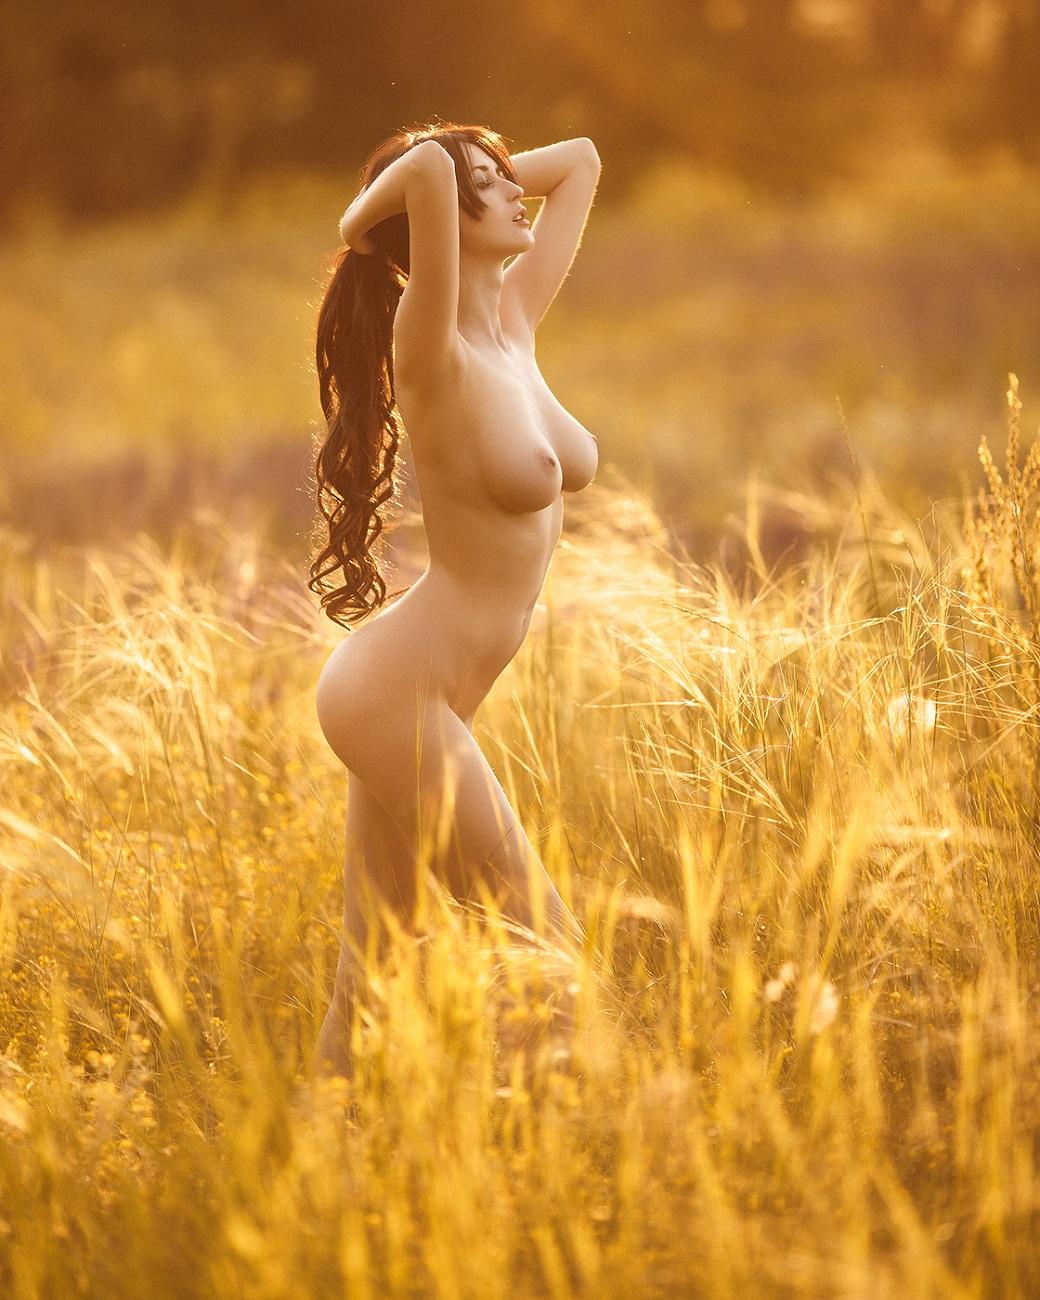 эротика это красиво-картинки